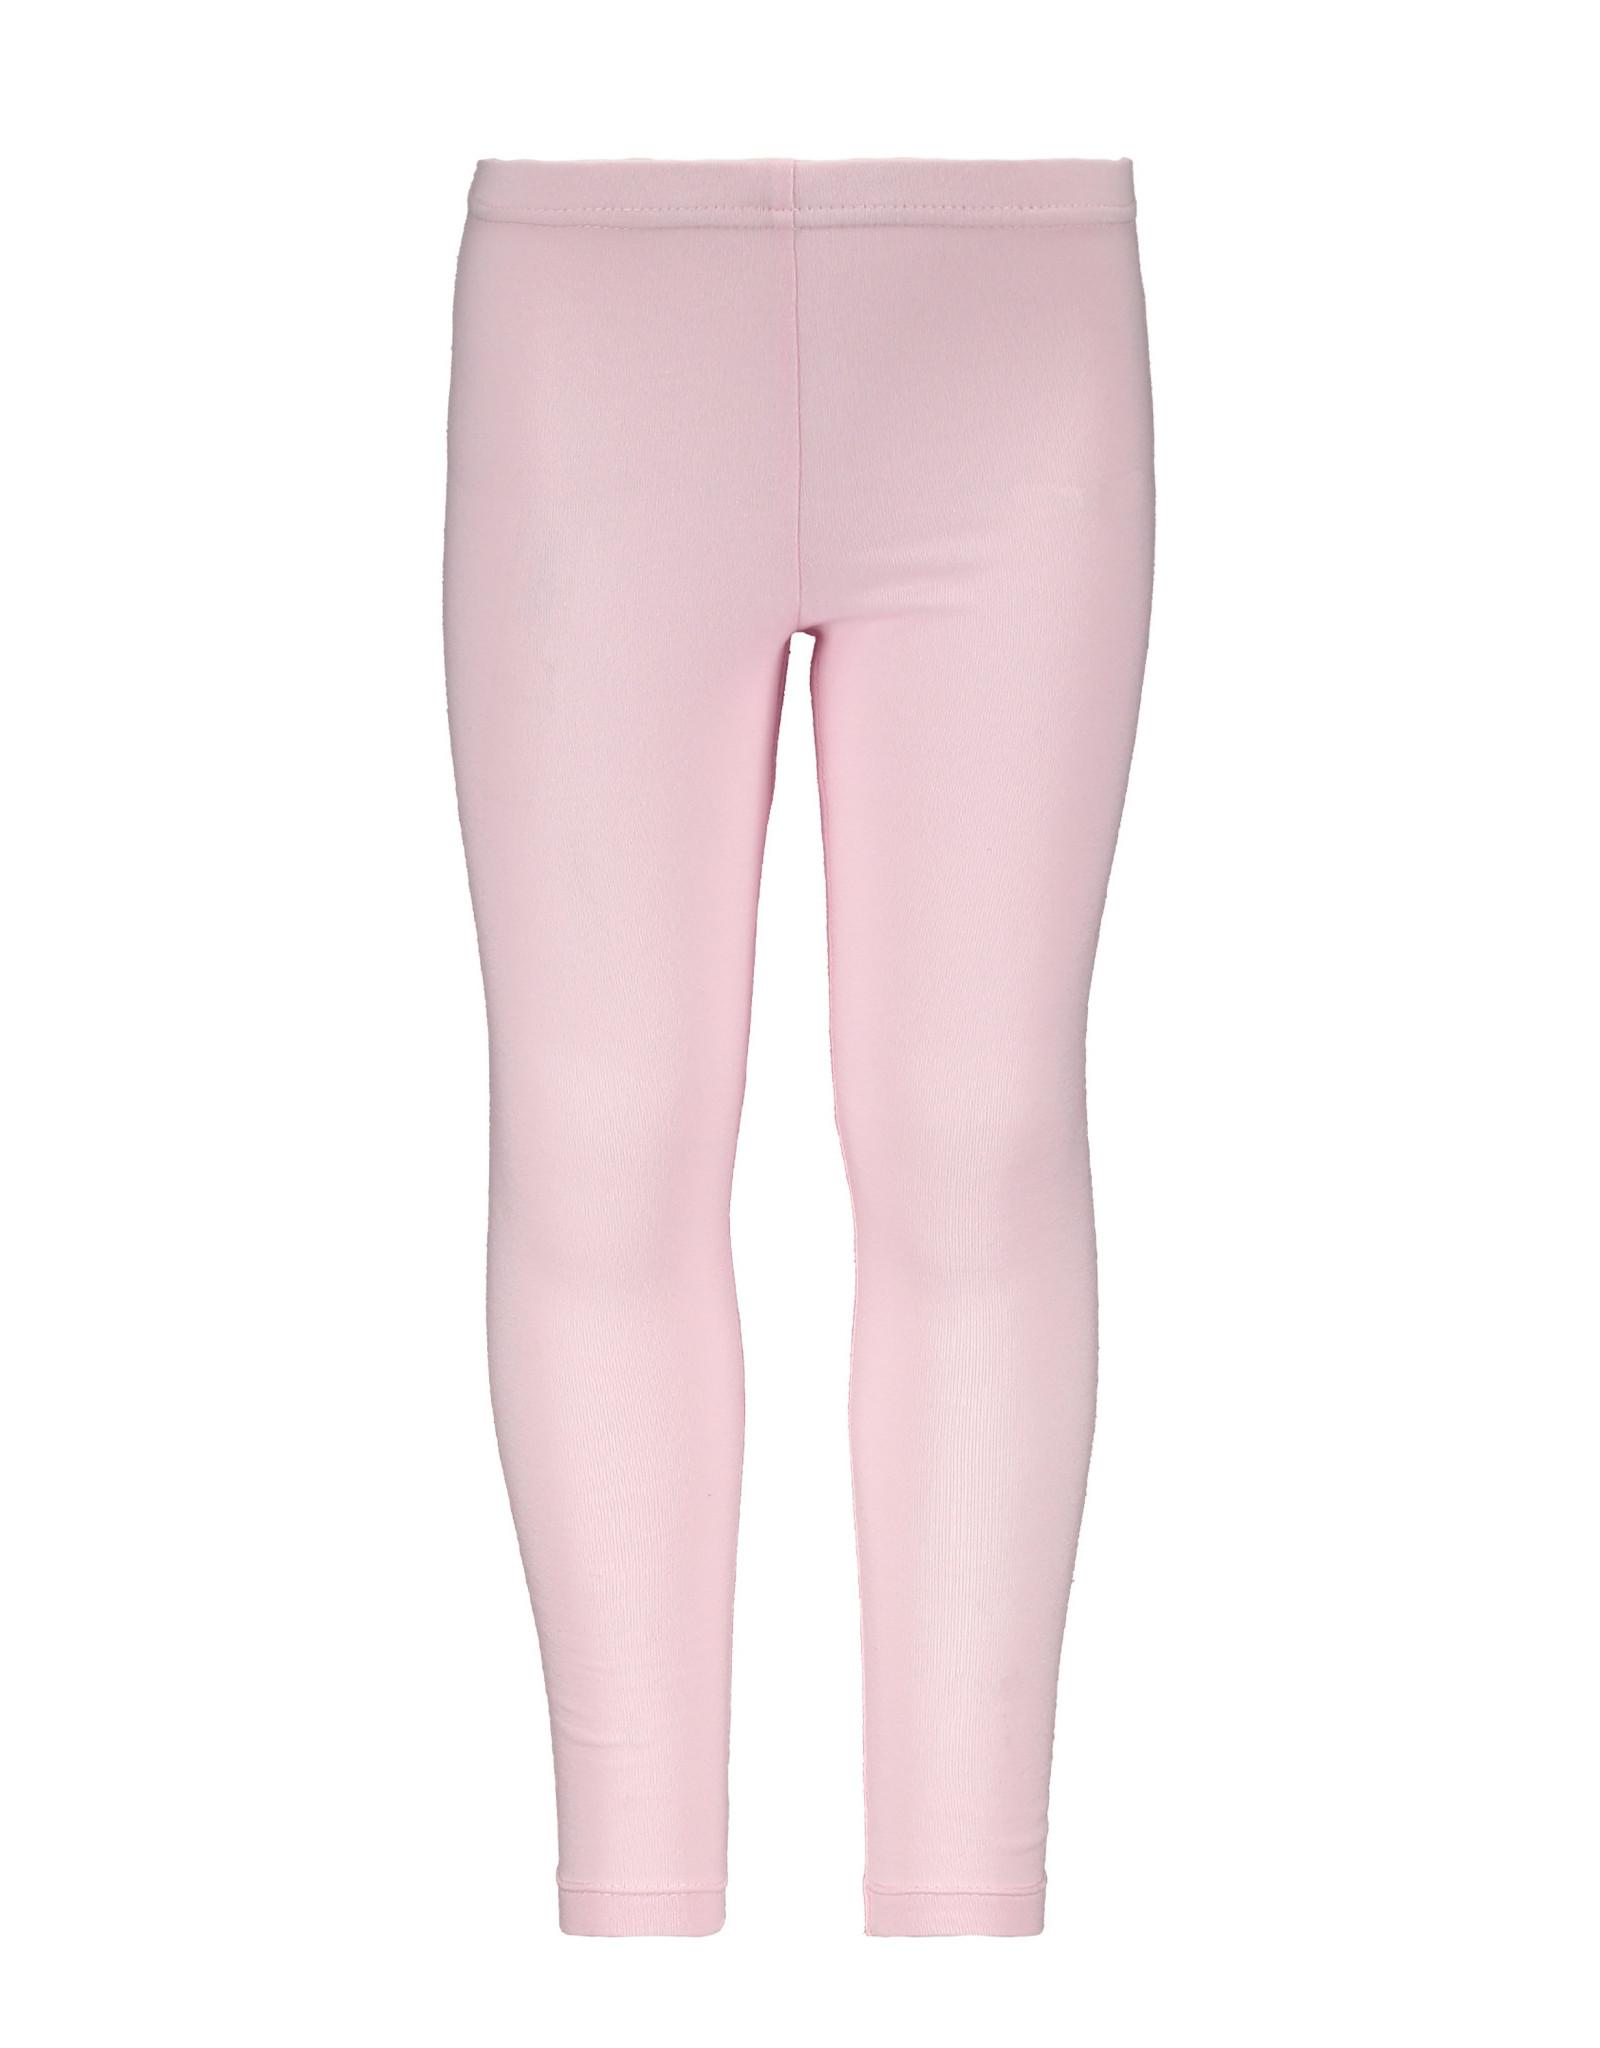 Bampidano Bampidano meisjes legging Dawn Light Pink